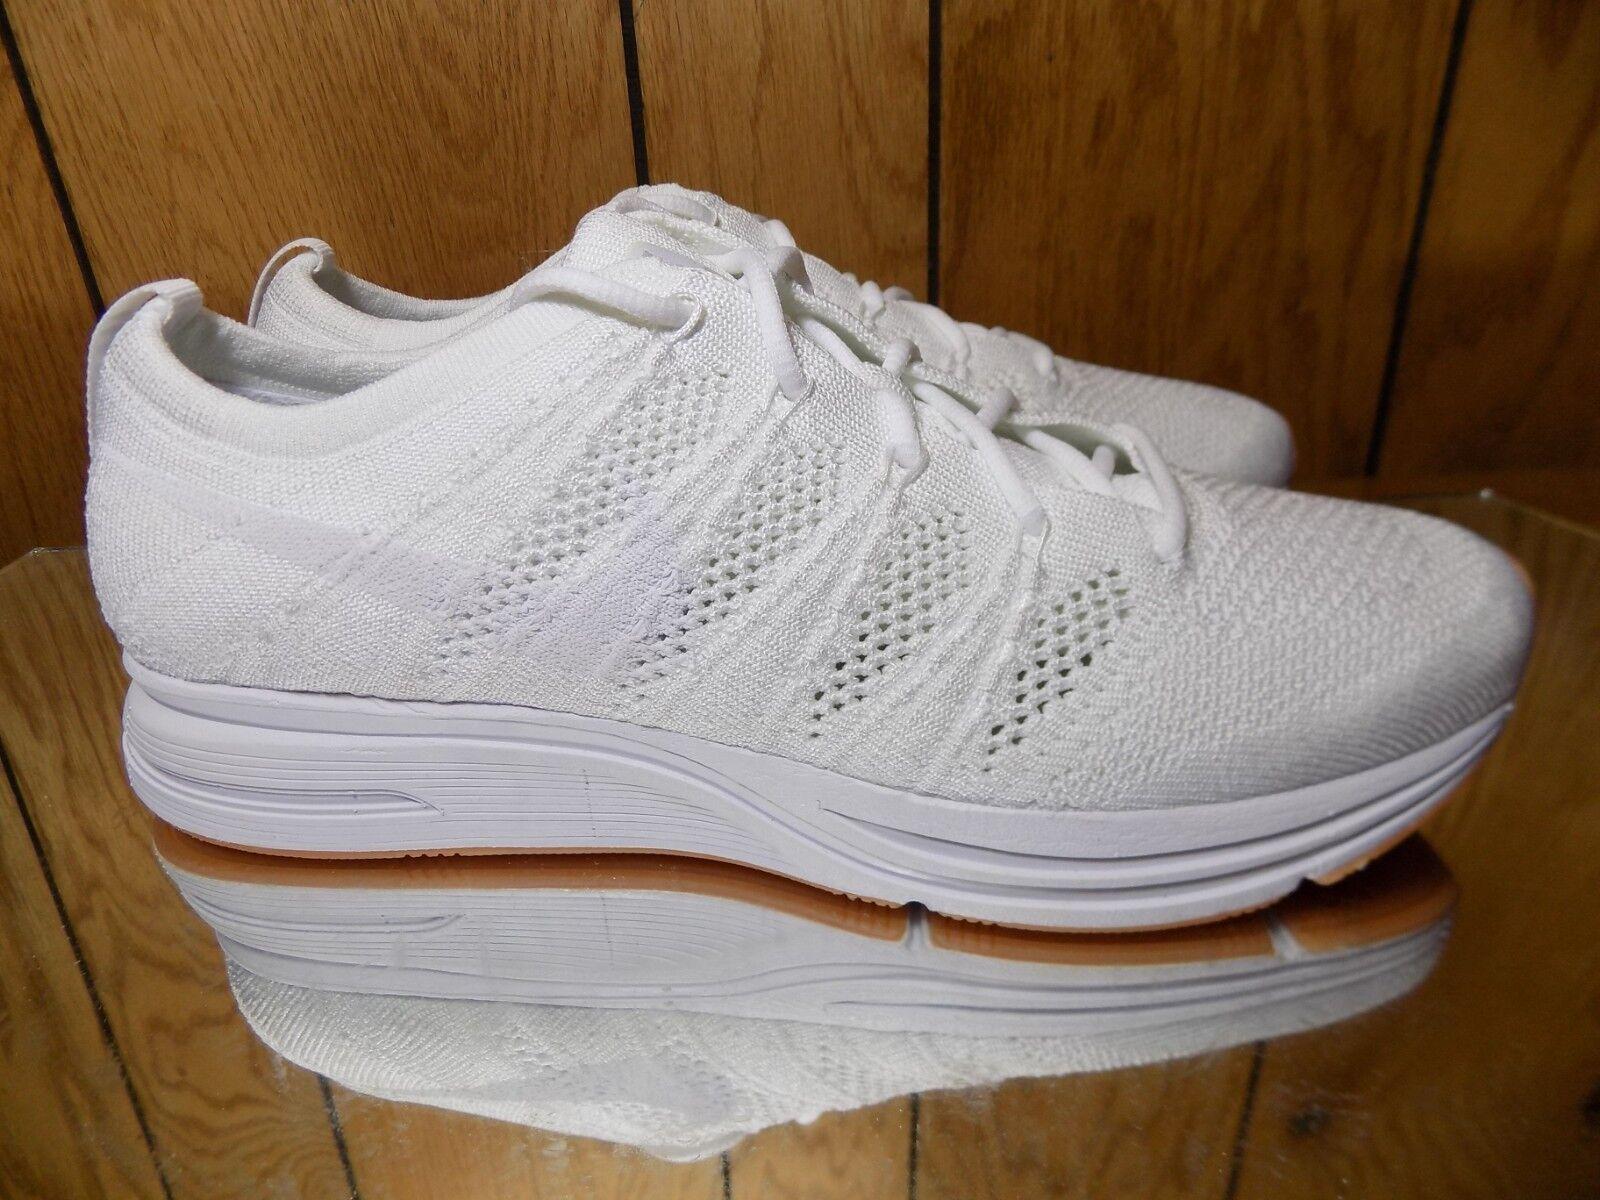 Nike Flyknit Trainer Triple White AH8396-102 Running shoes Men's s 10